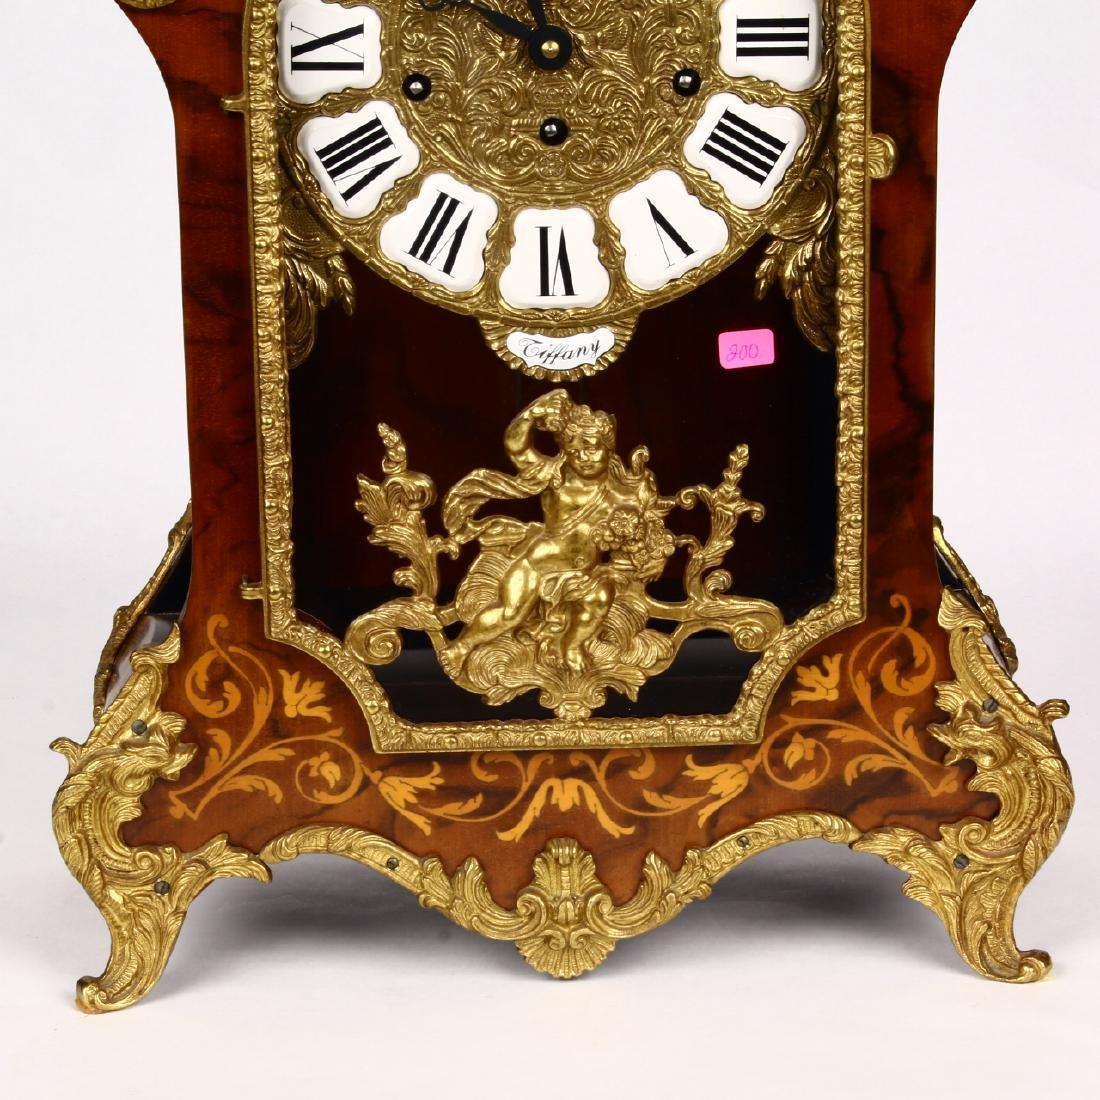 Tiffany Boulle Mantle Clock Brass Ormolu Cherubs Inlaid - 4